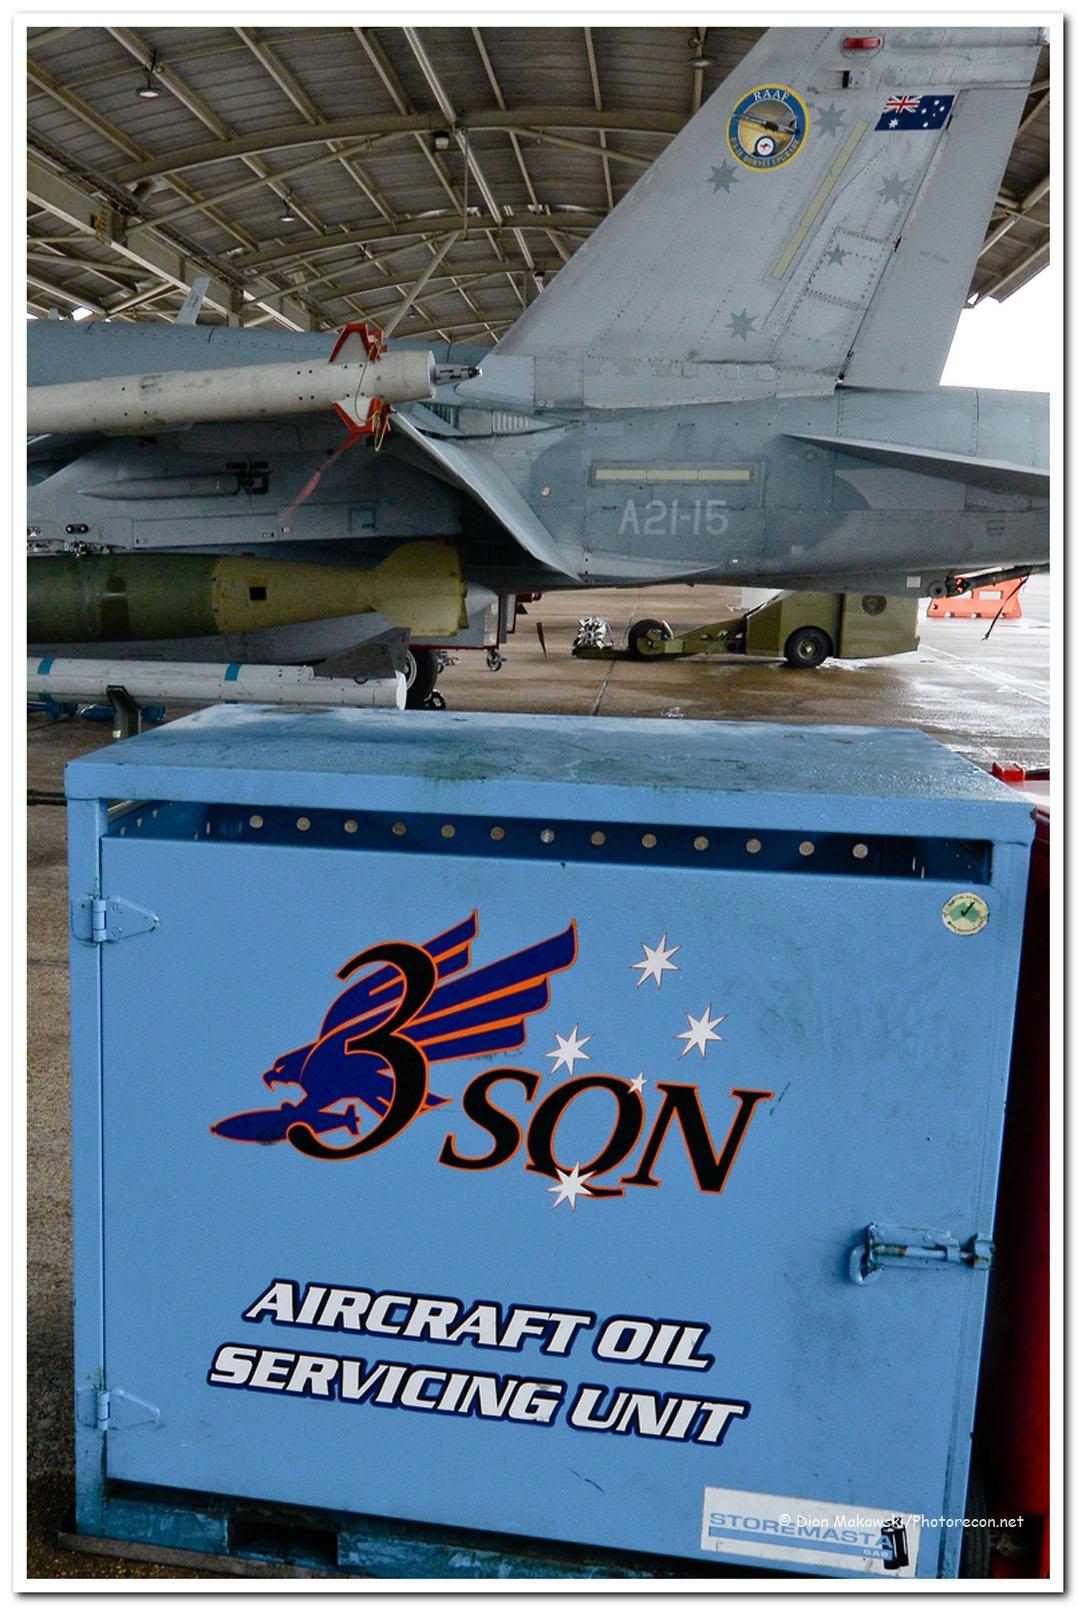 3 Squadron maintenance